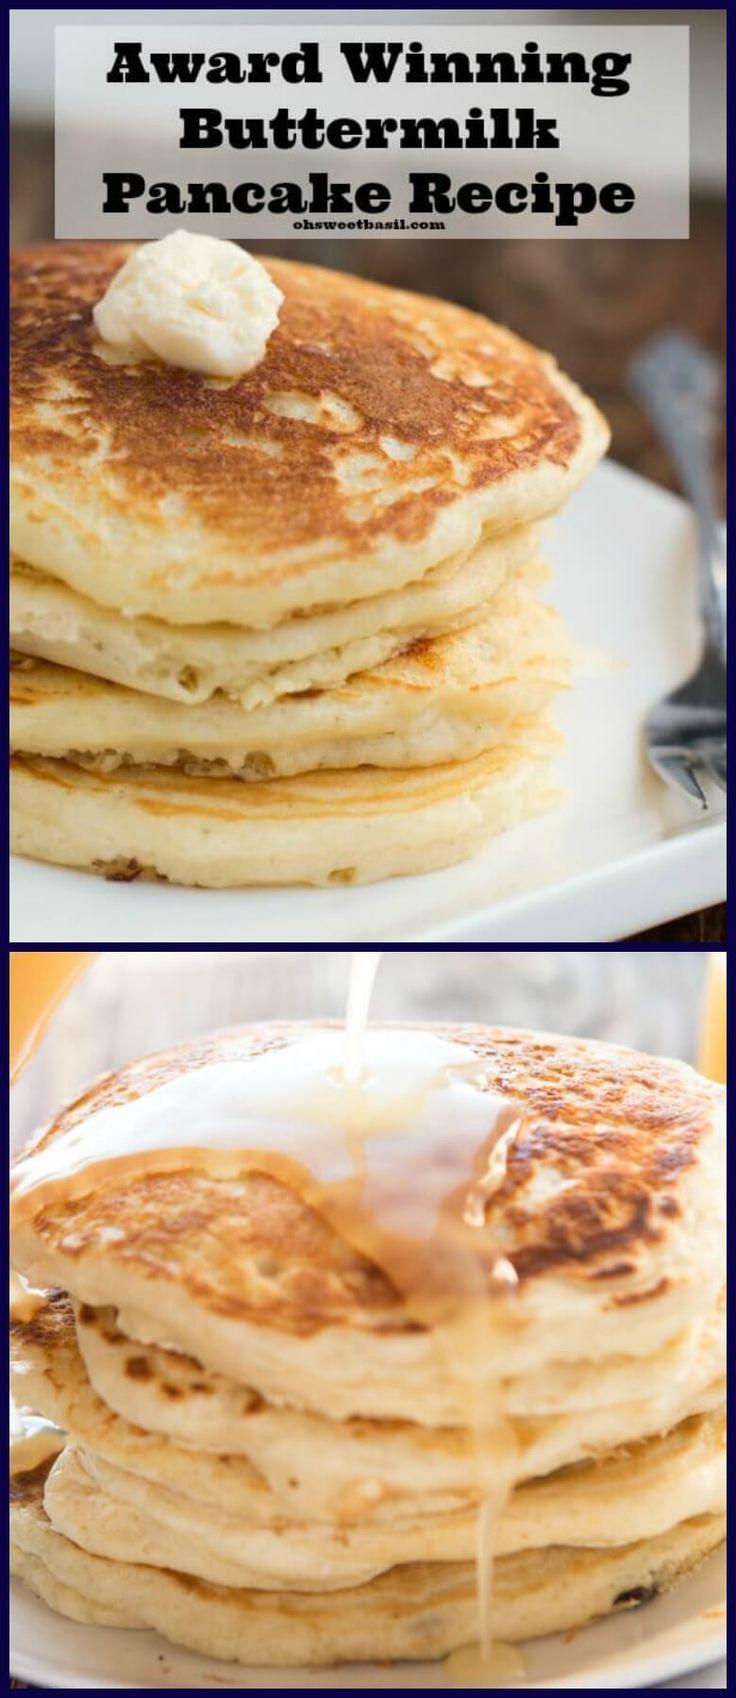 100 breakfast recipes on pinterest yummy breakfast for Award winning pancake recipe